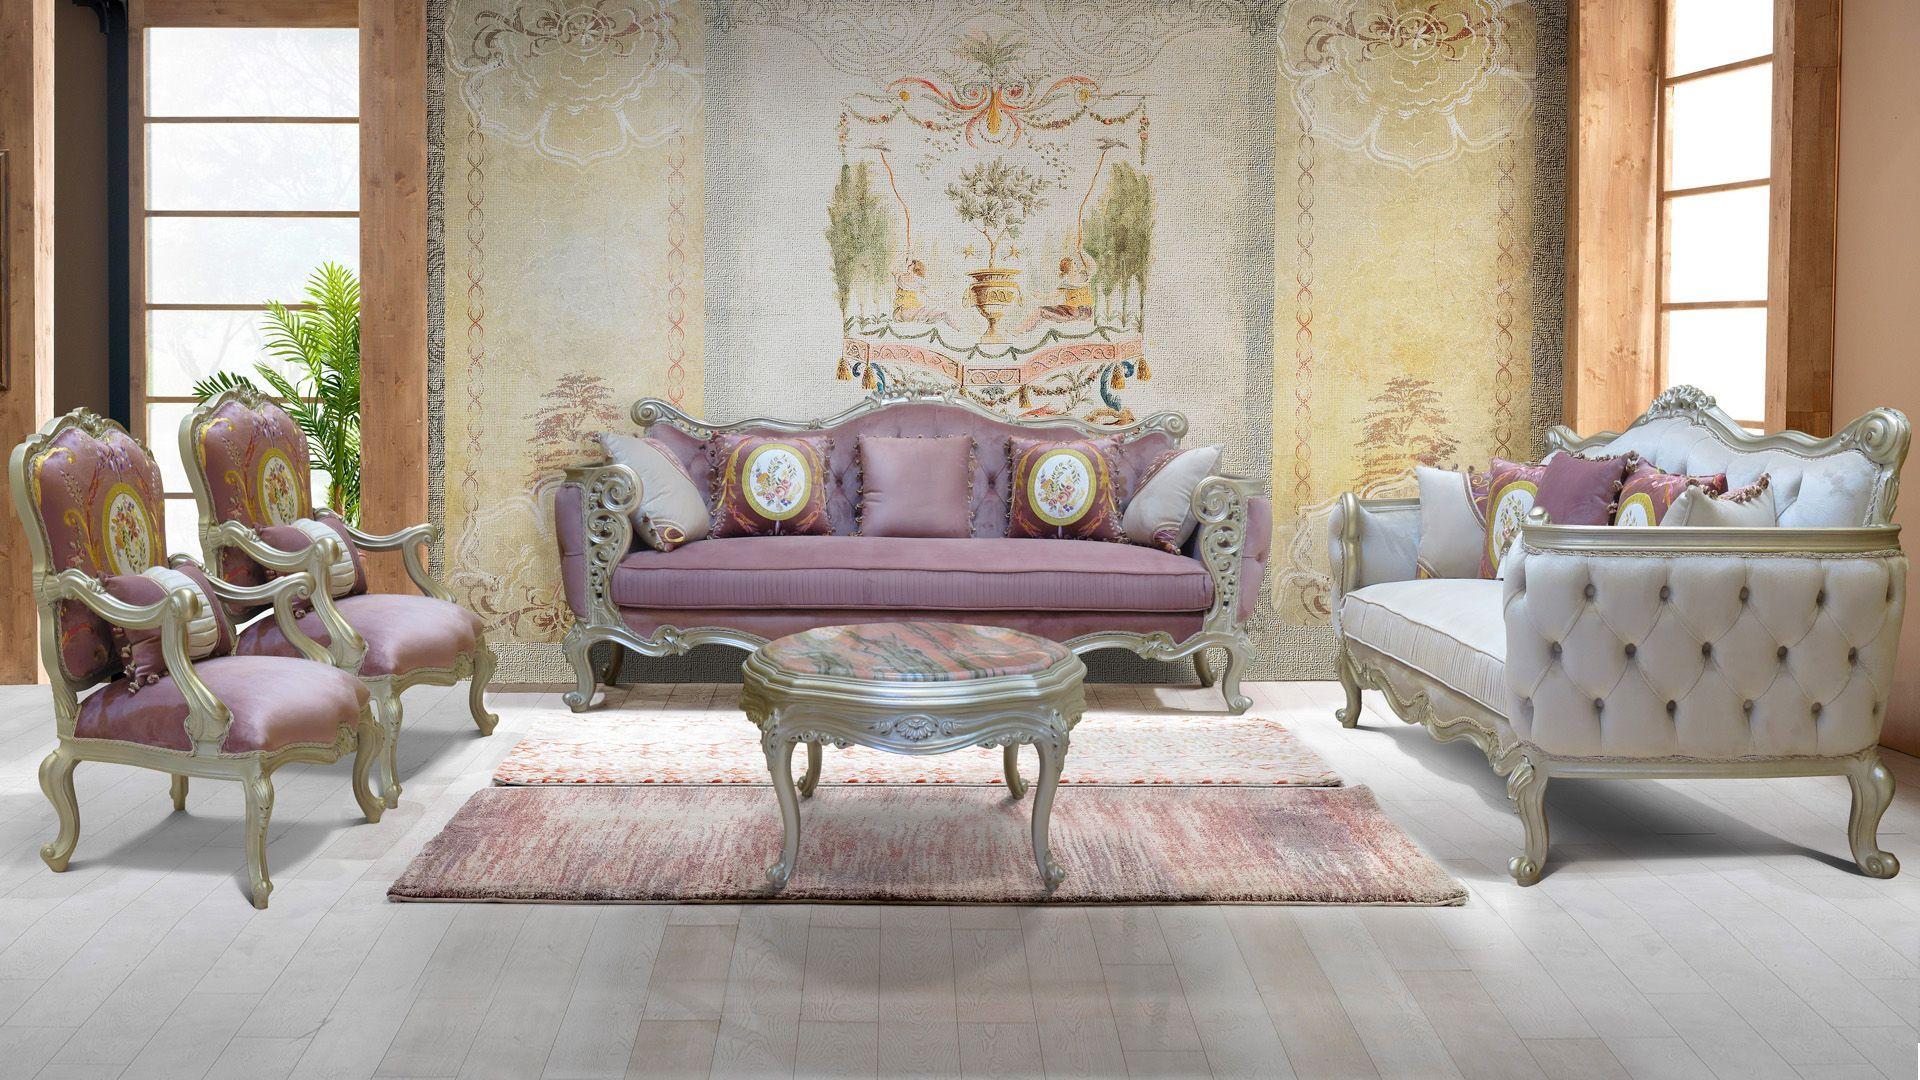 Gloria صالون كلاسيكي In 2021 Furniture Decor Home Decor